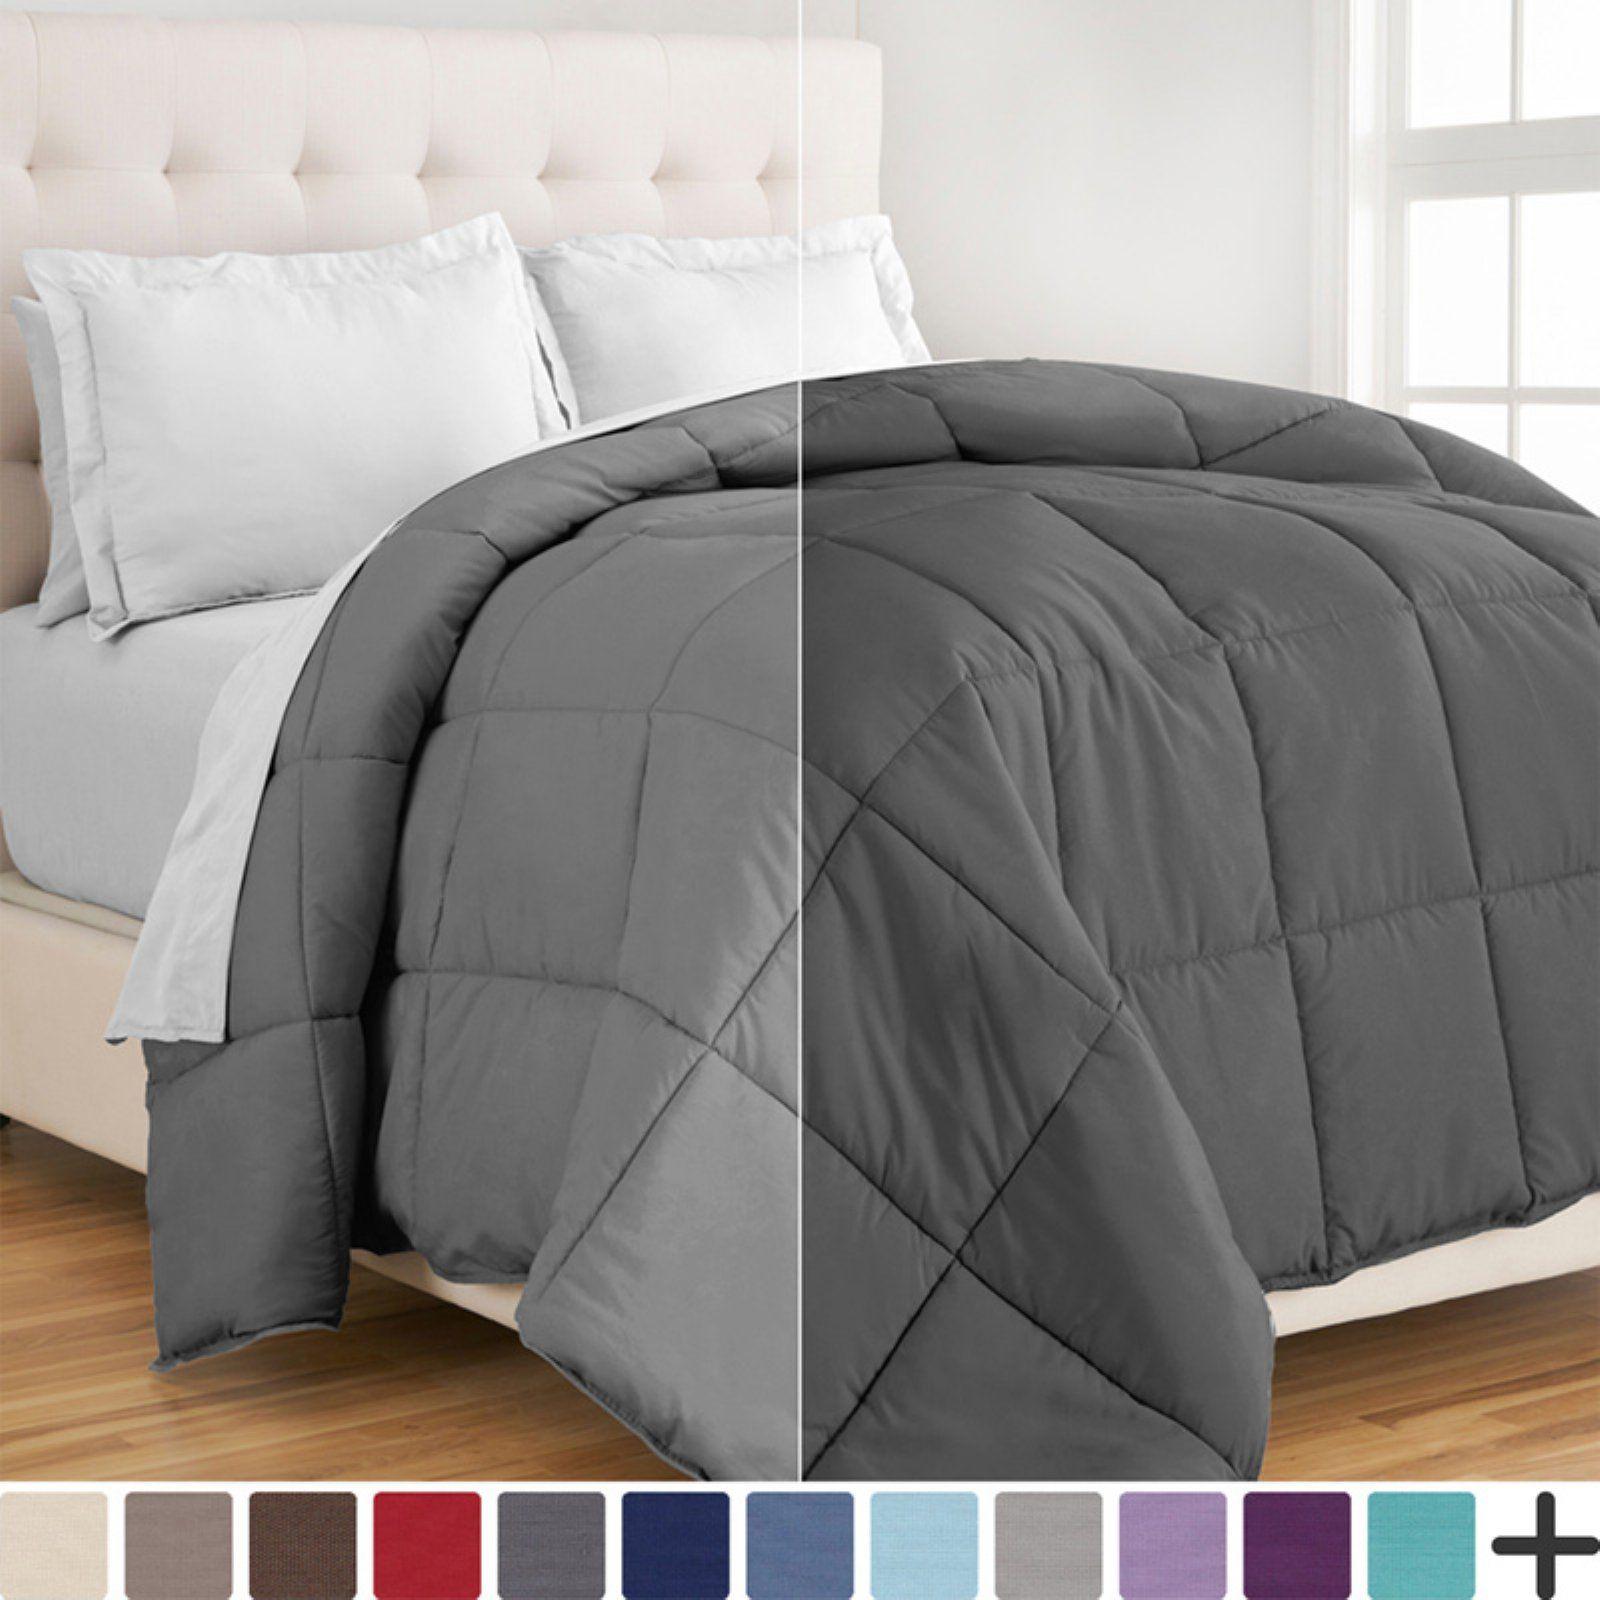 Bare Home 1800 Series Goose Down Alternative Reversible Comforter